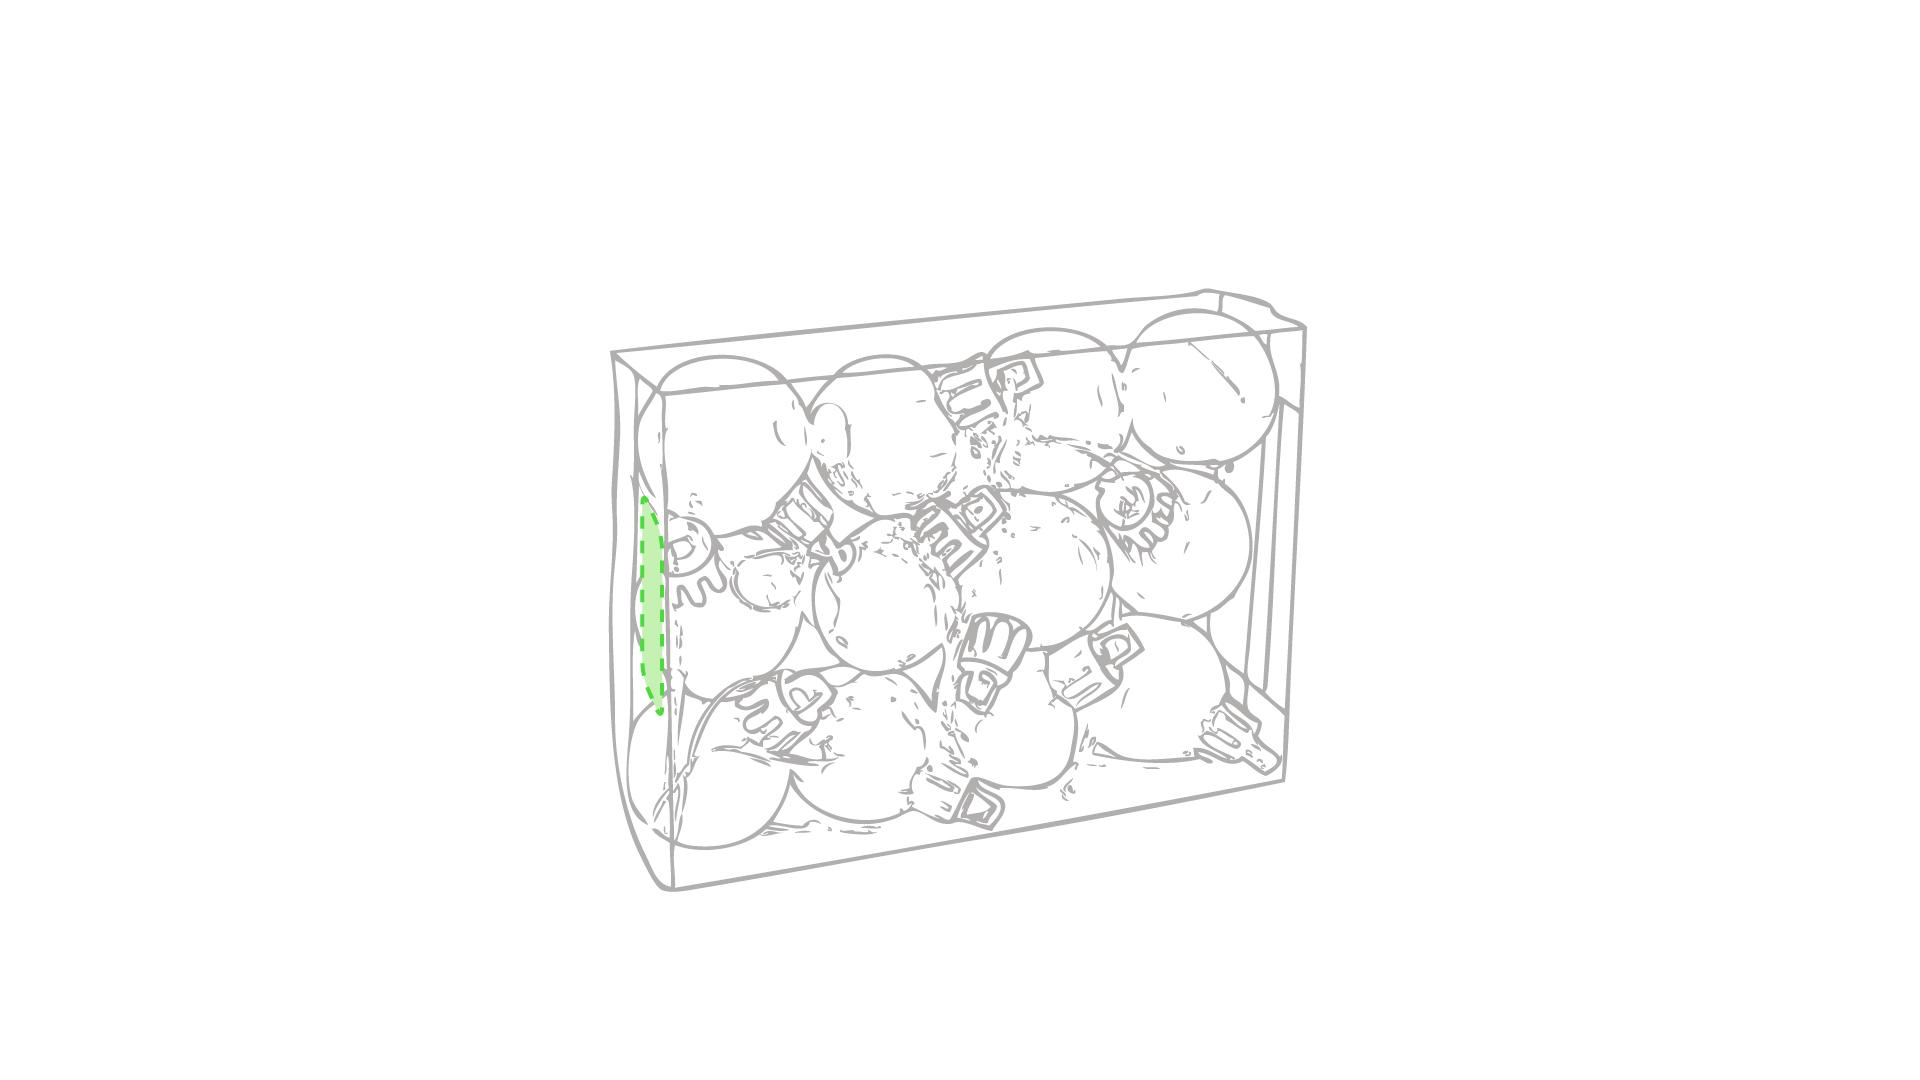 Caja de presentación (lateral izquierdo)